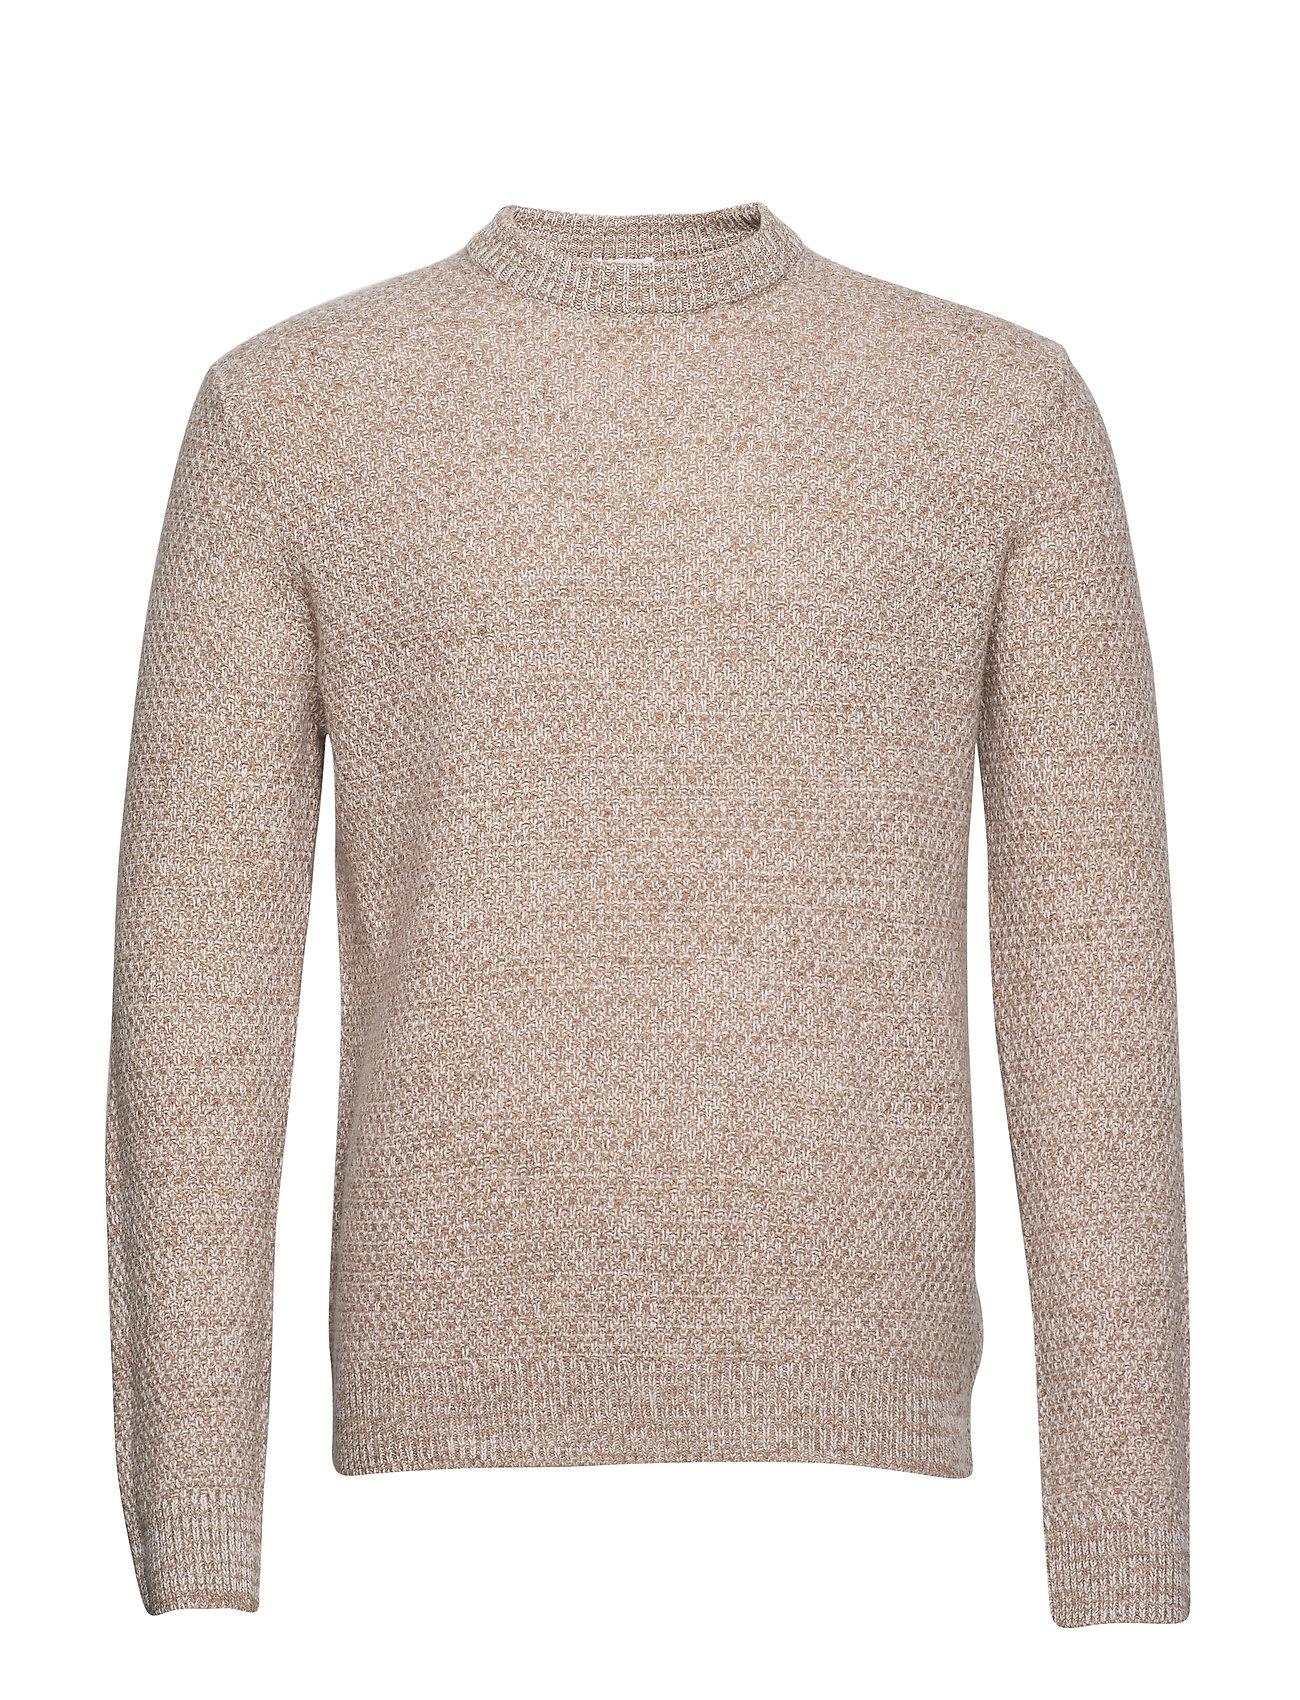 Filippa K M. Tobias Sweater - KHAKI BEIG